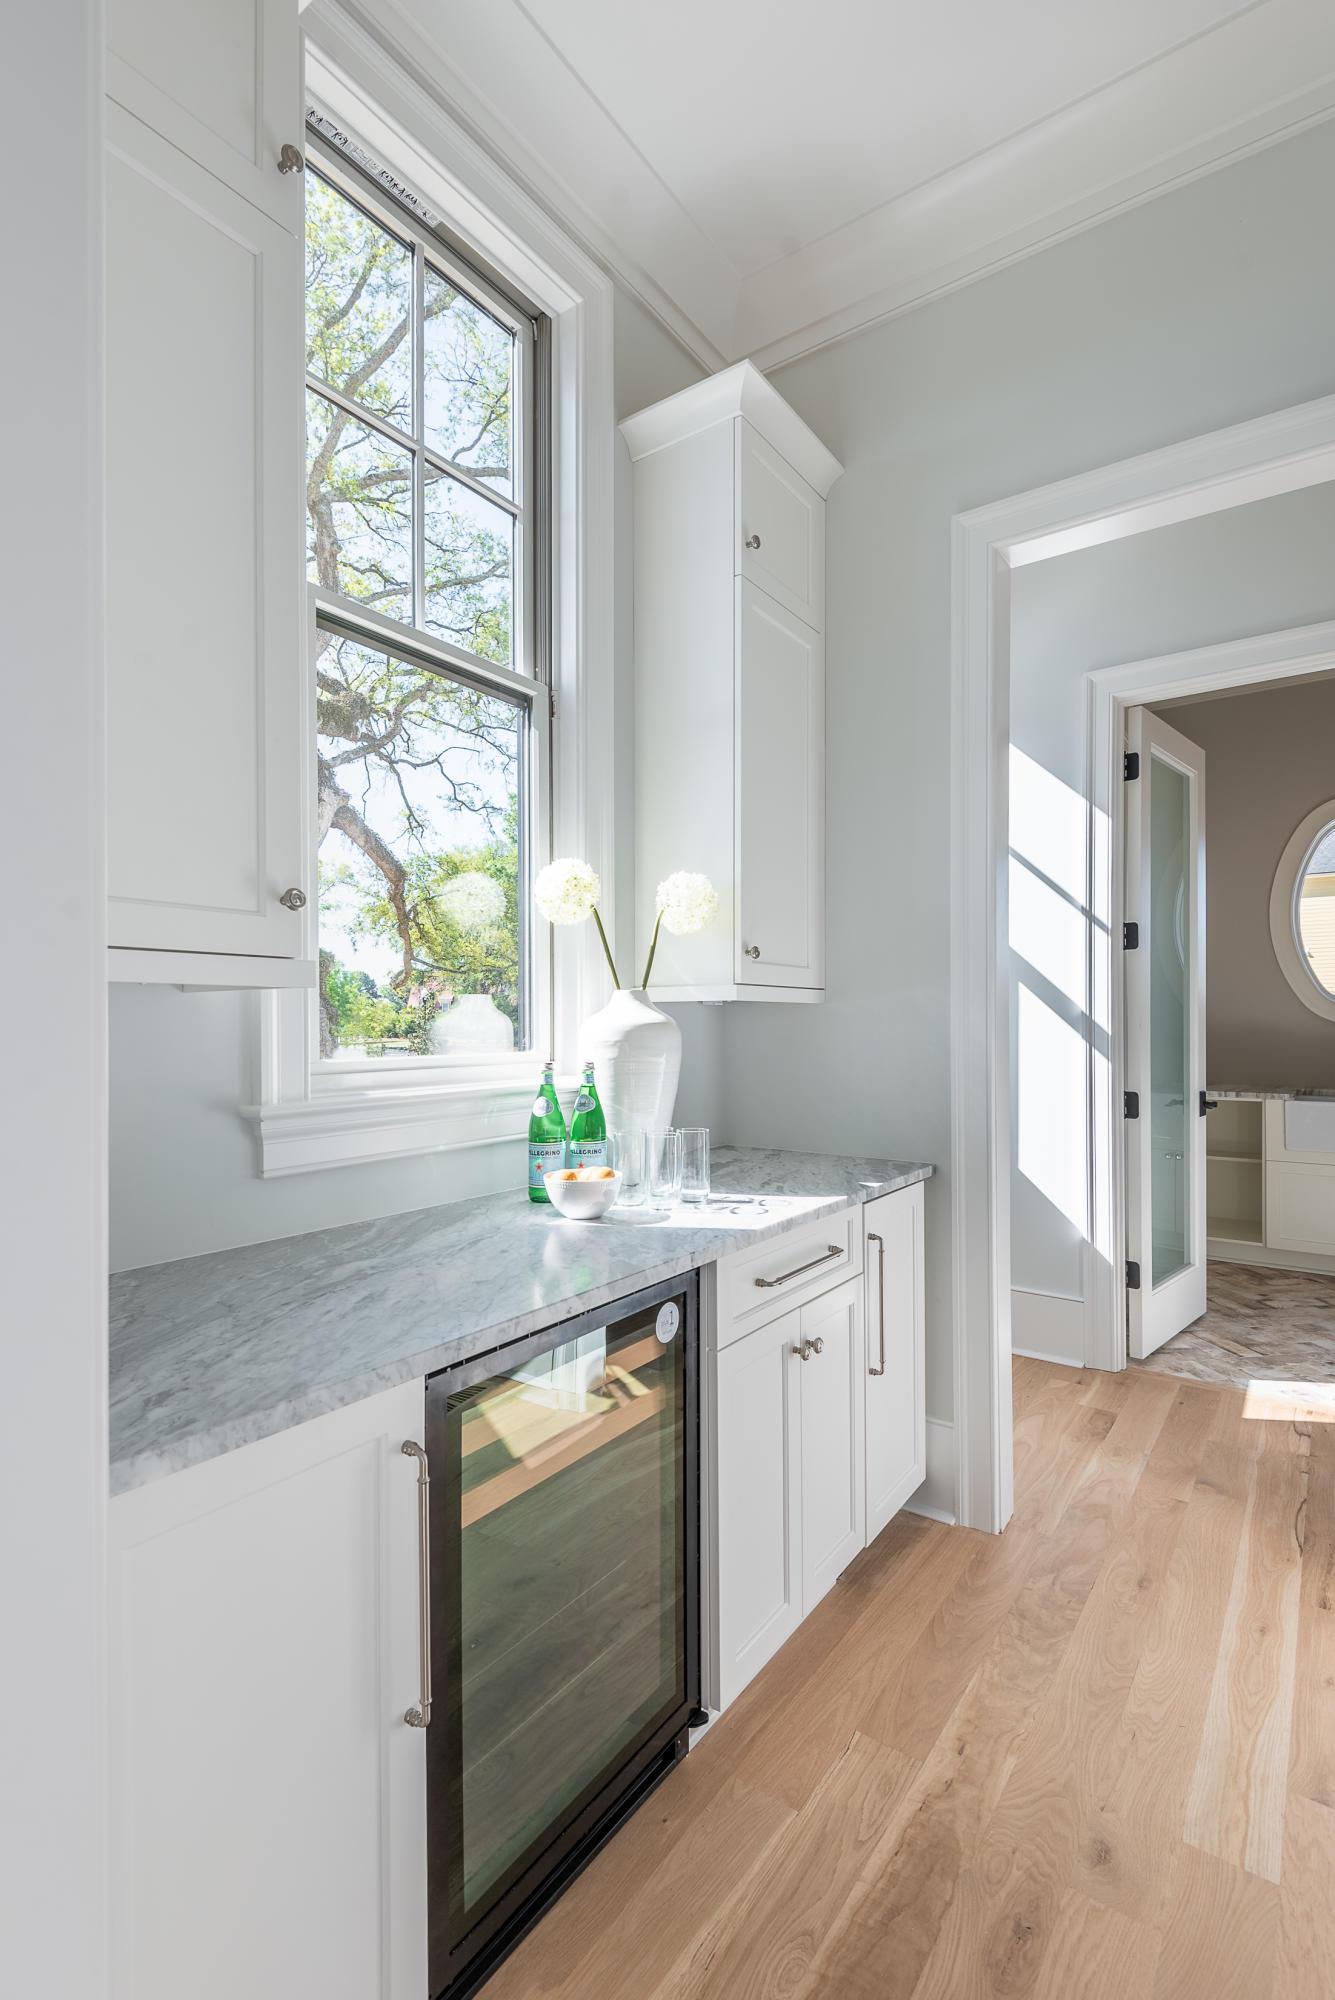 Daniel Island Park Homes For Sale - 449 Lesesne, Charleston, SC - 7